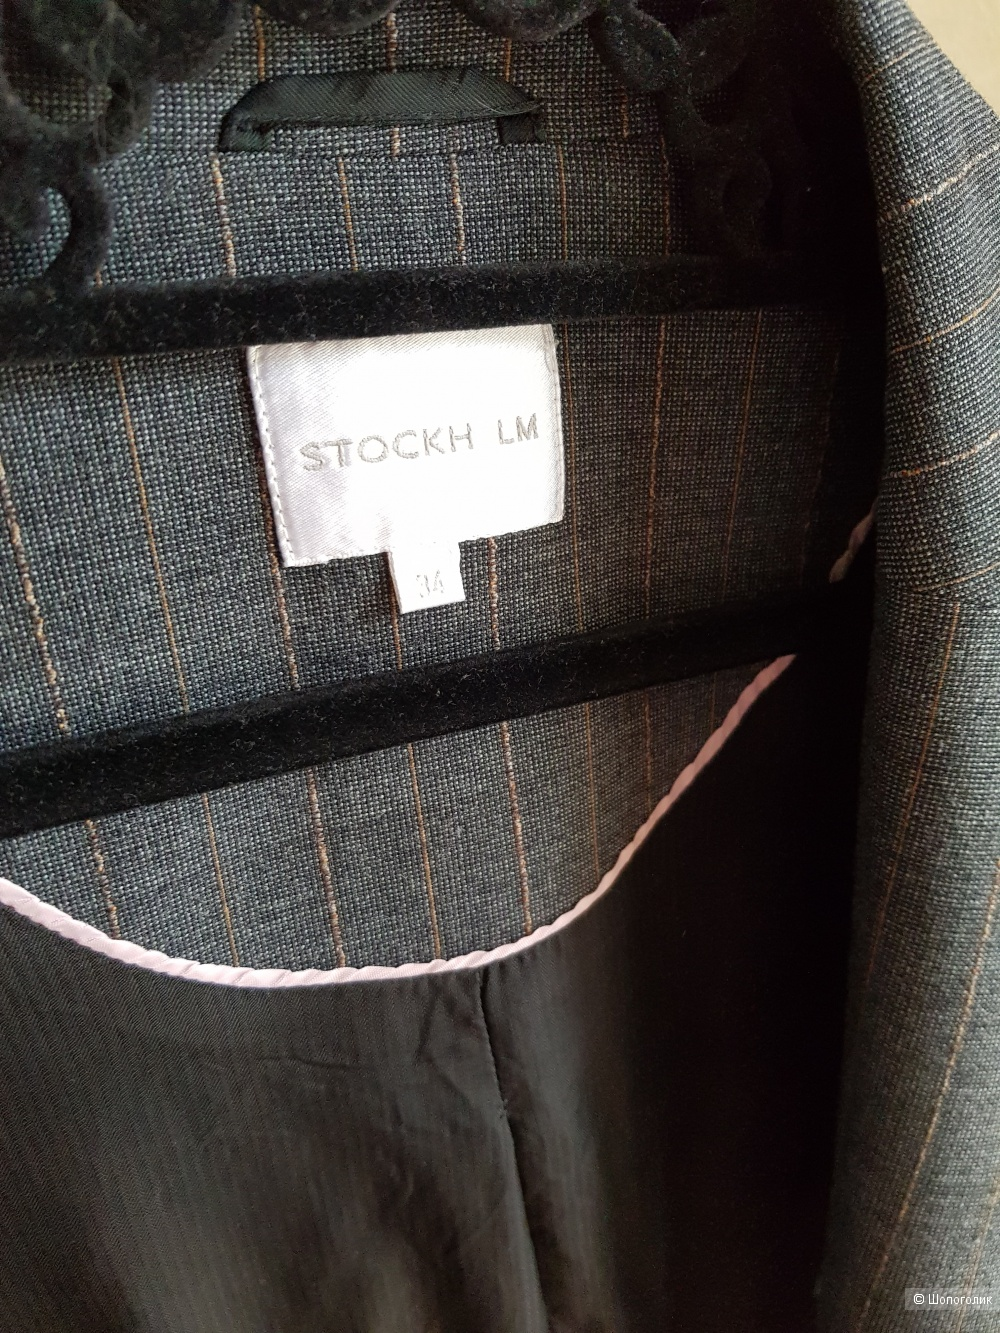 Пиджак STOCKH S (EU34) размер